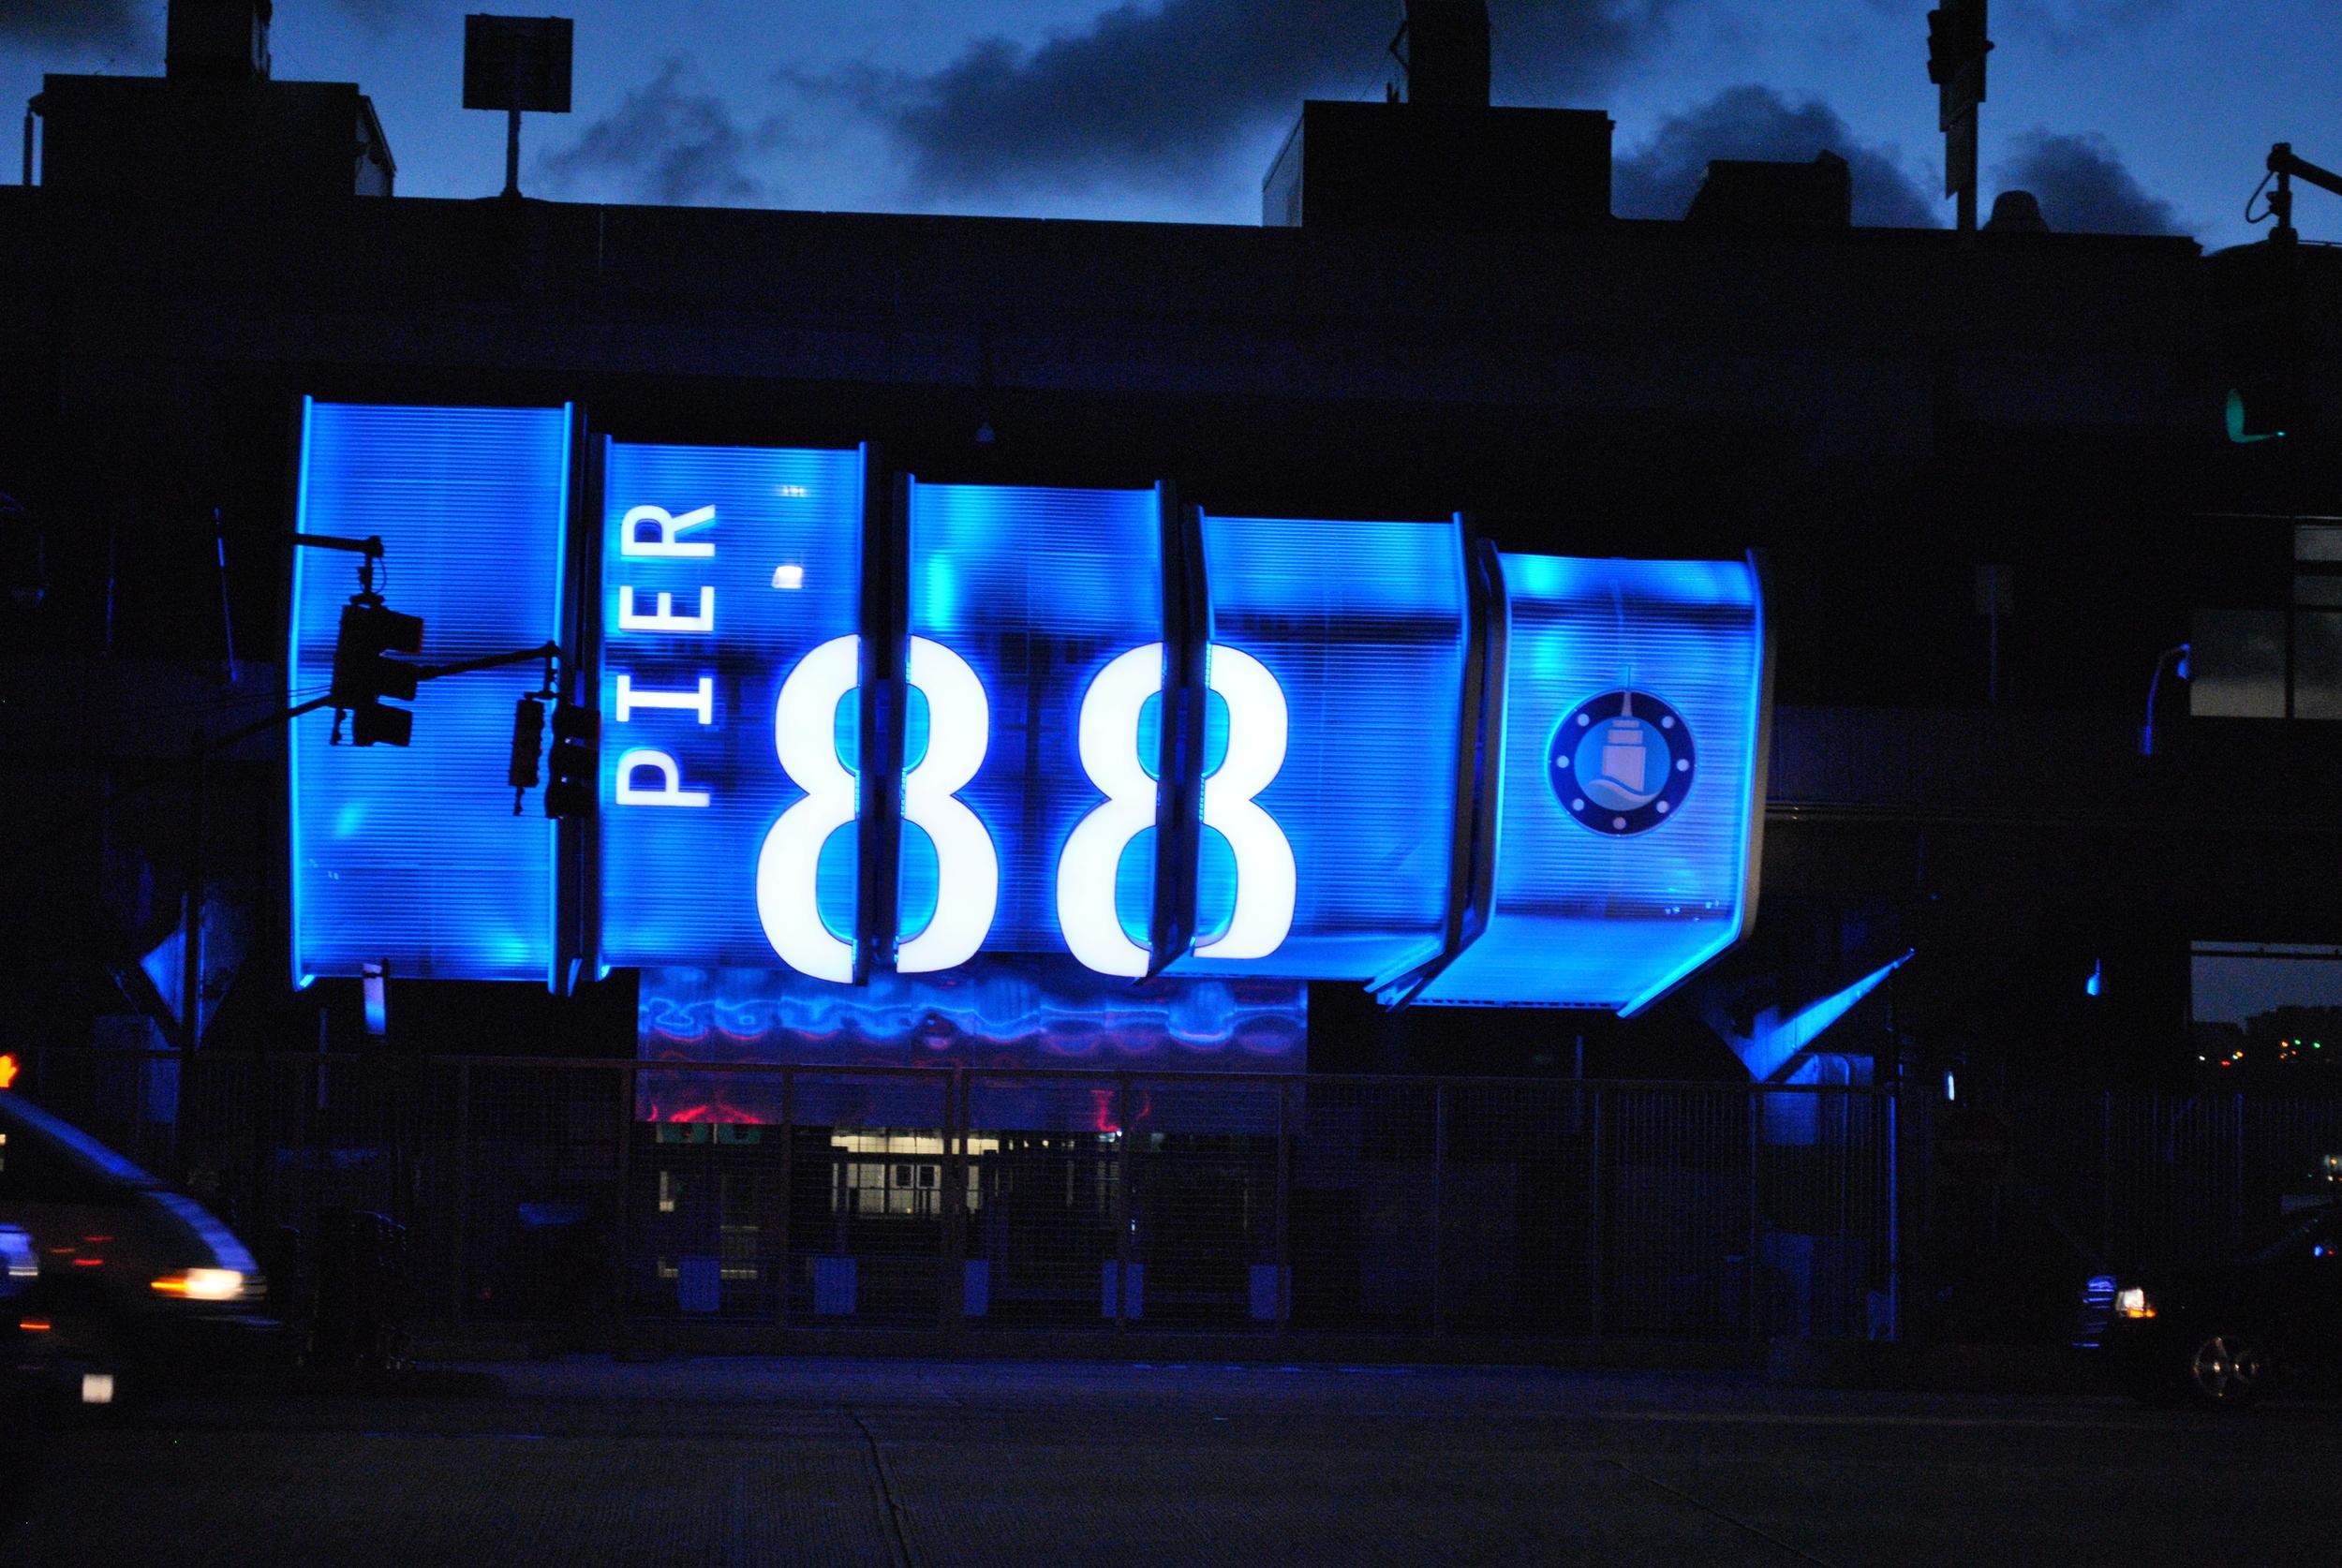 Pier 88 & 90